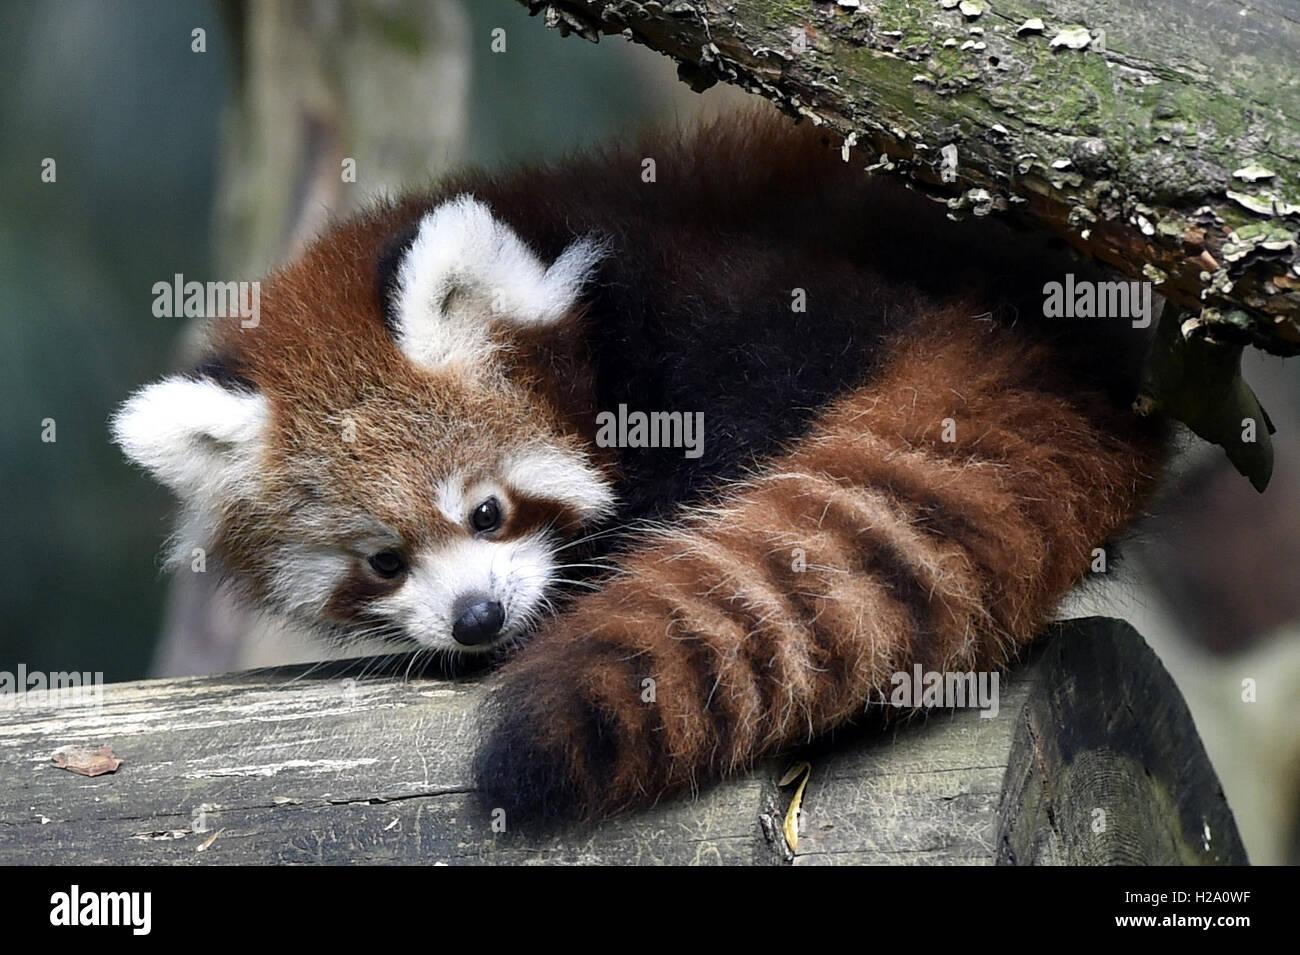 Zlin, Czech Republic. 26th Sep, 2016. Red panda cub sits on a tree in the zoo Zlin, Czech Republic, September 26, - Stock Image